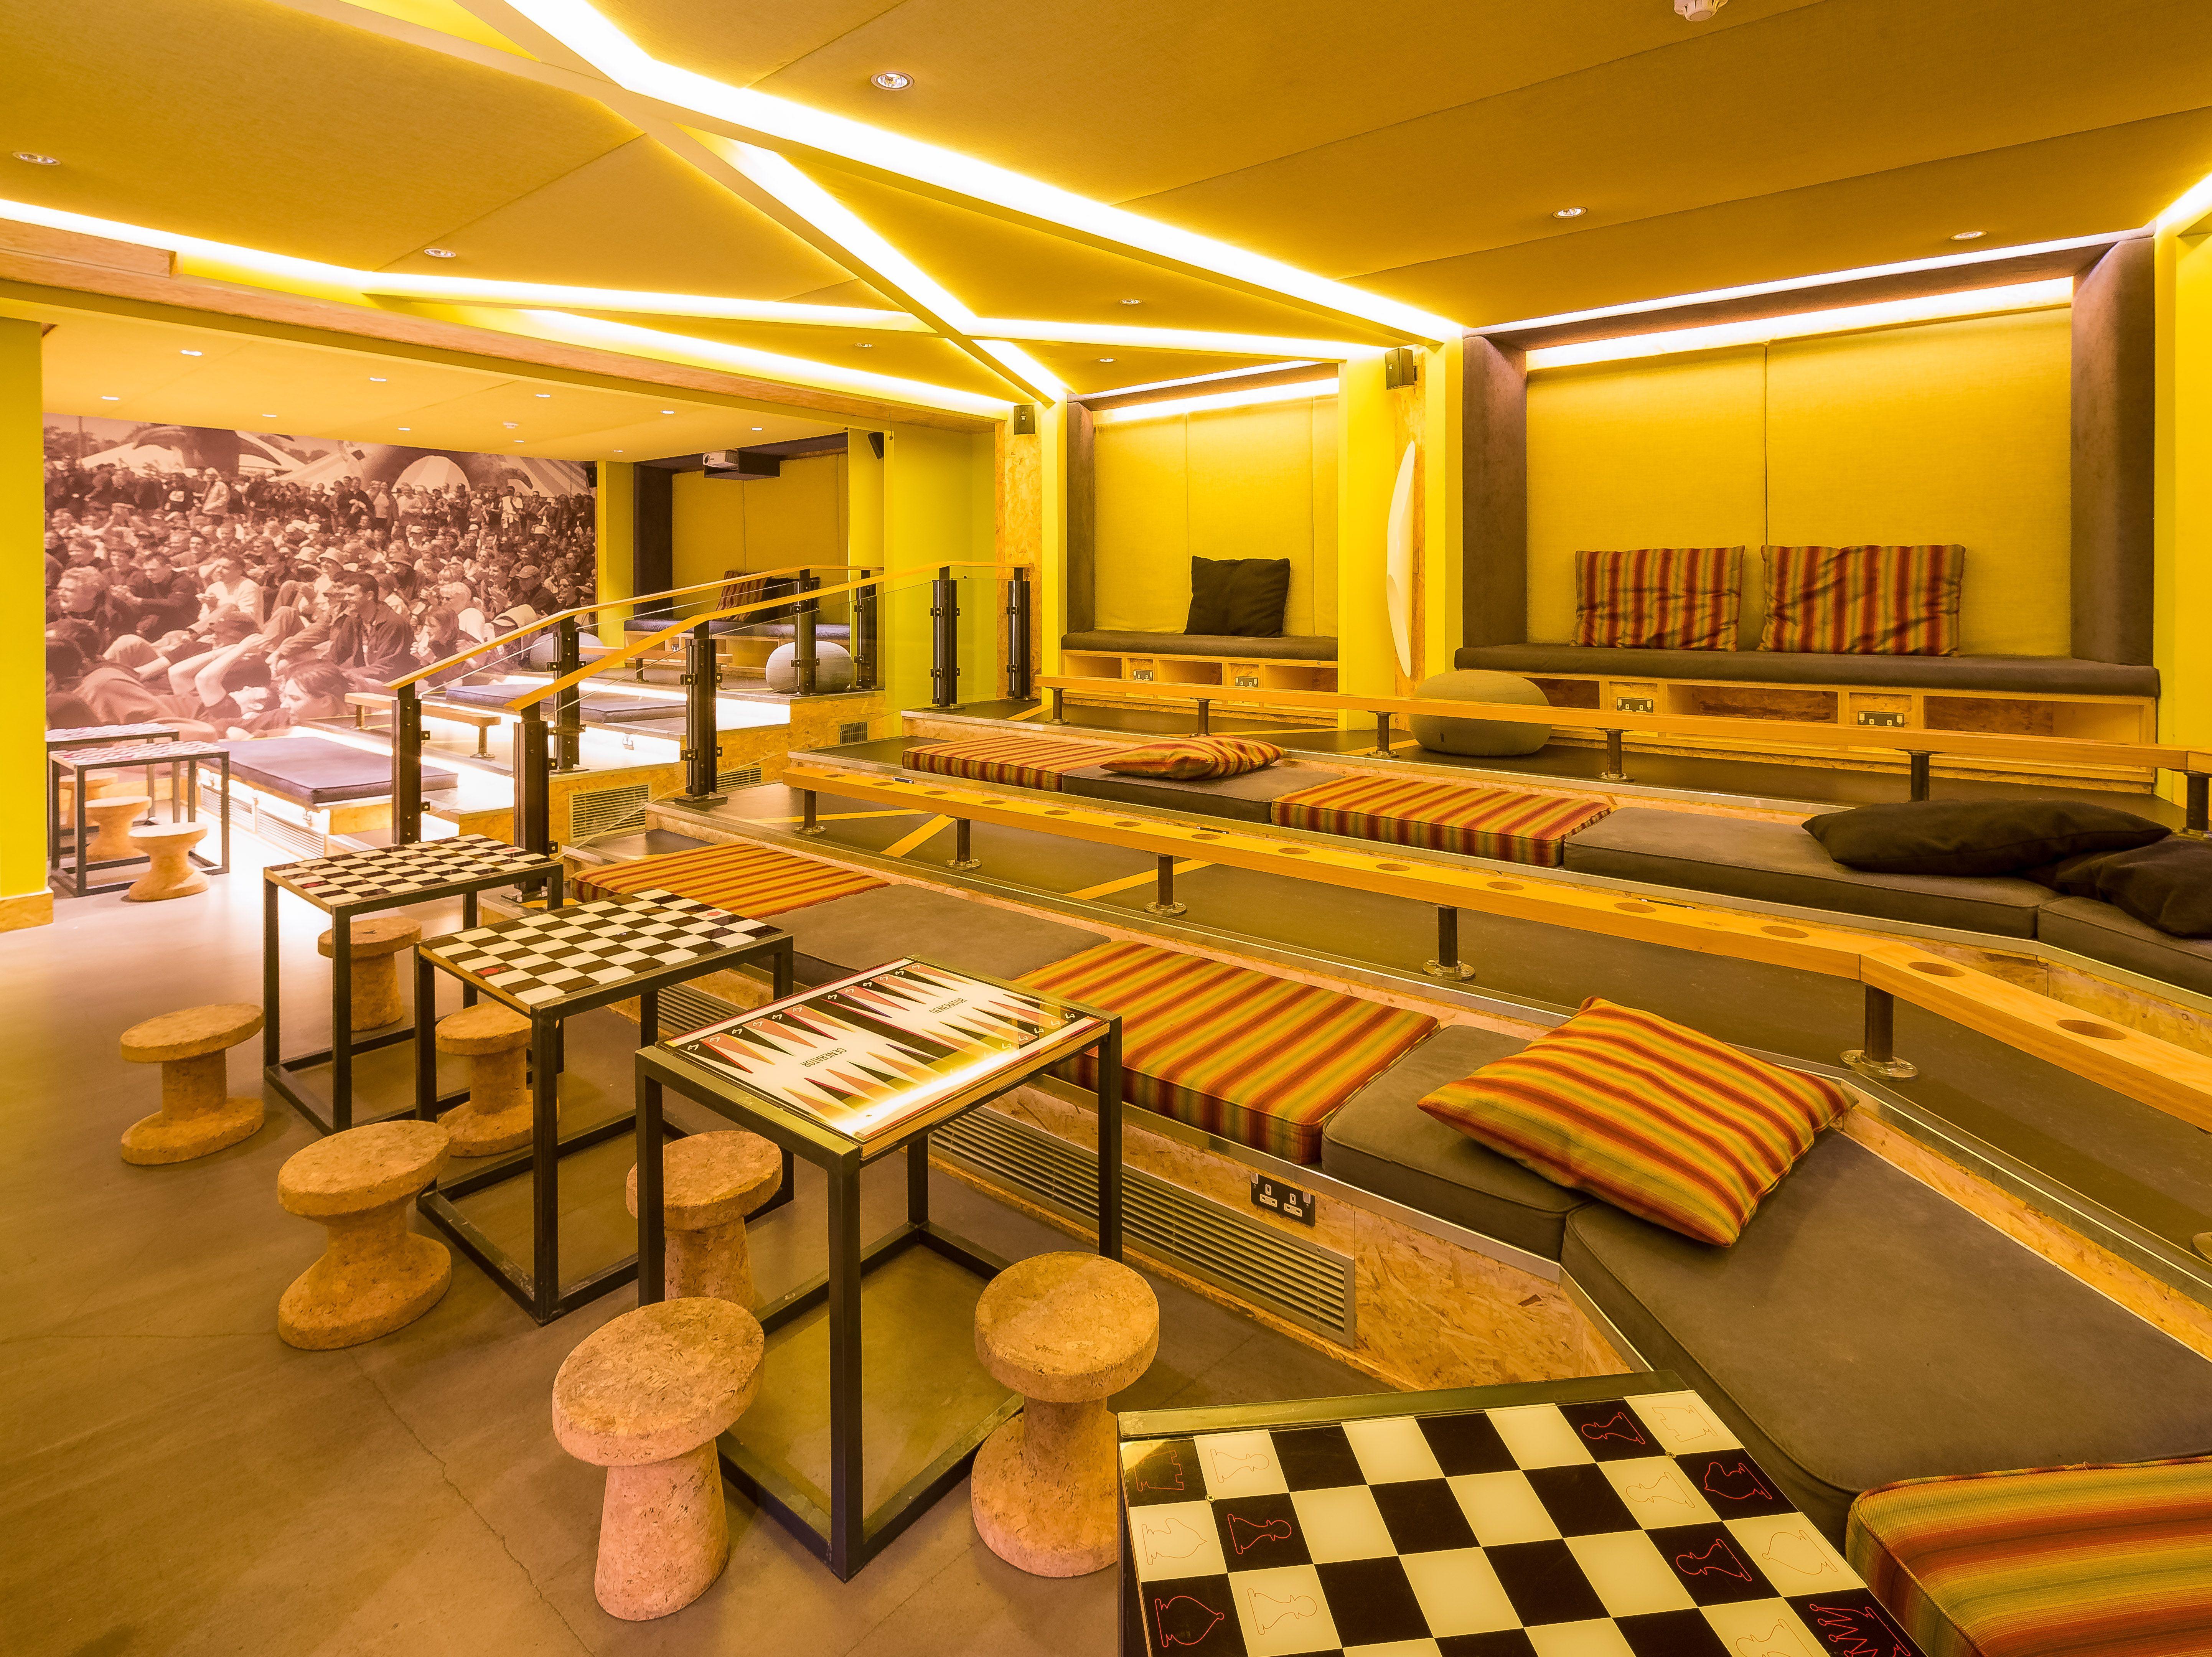 east london sofa cinema flexsteel sleeper air mattress lounge and room at generator hostel